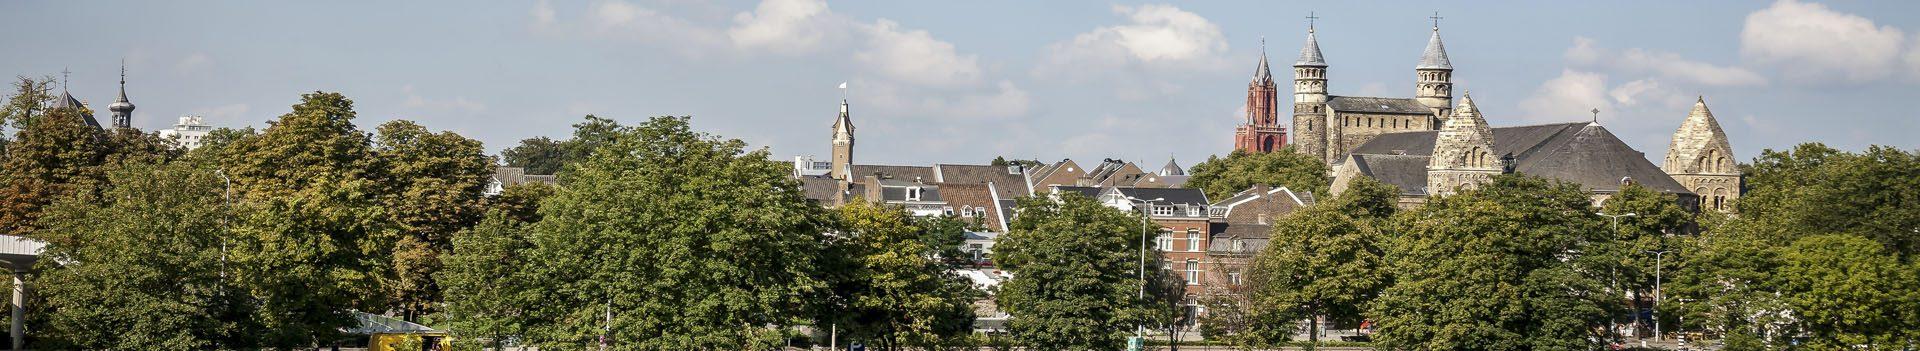 NGKv Zuiderkruis te Maastricht